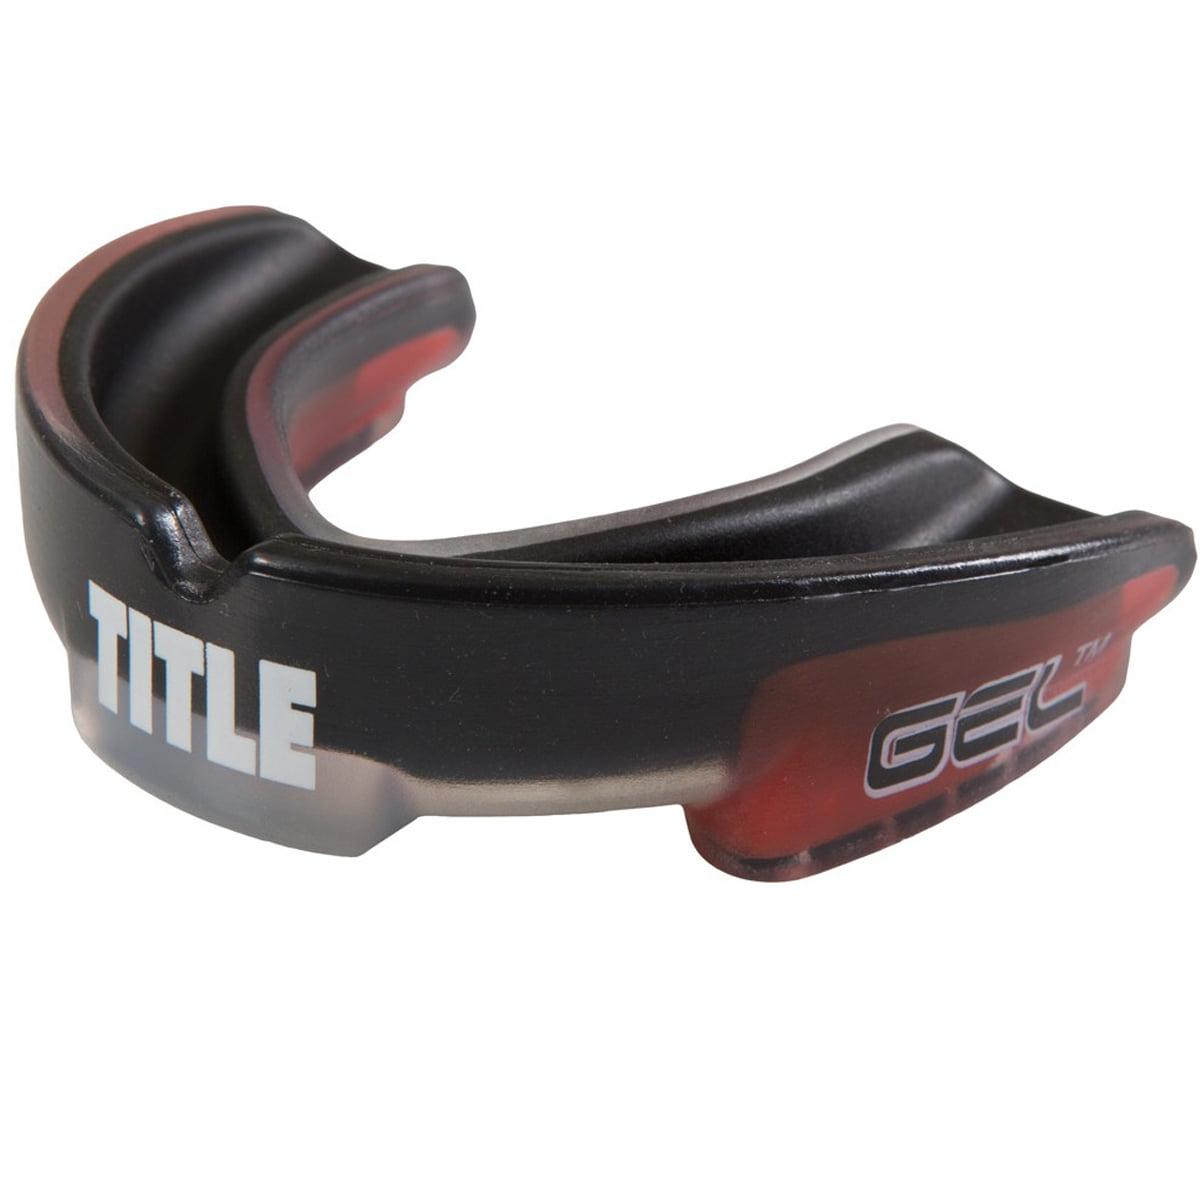 Title Boxing Gel Triple-Shox Mouthguard - Black/Red